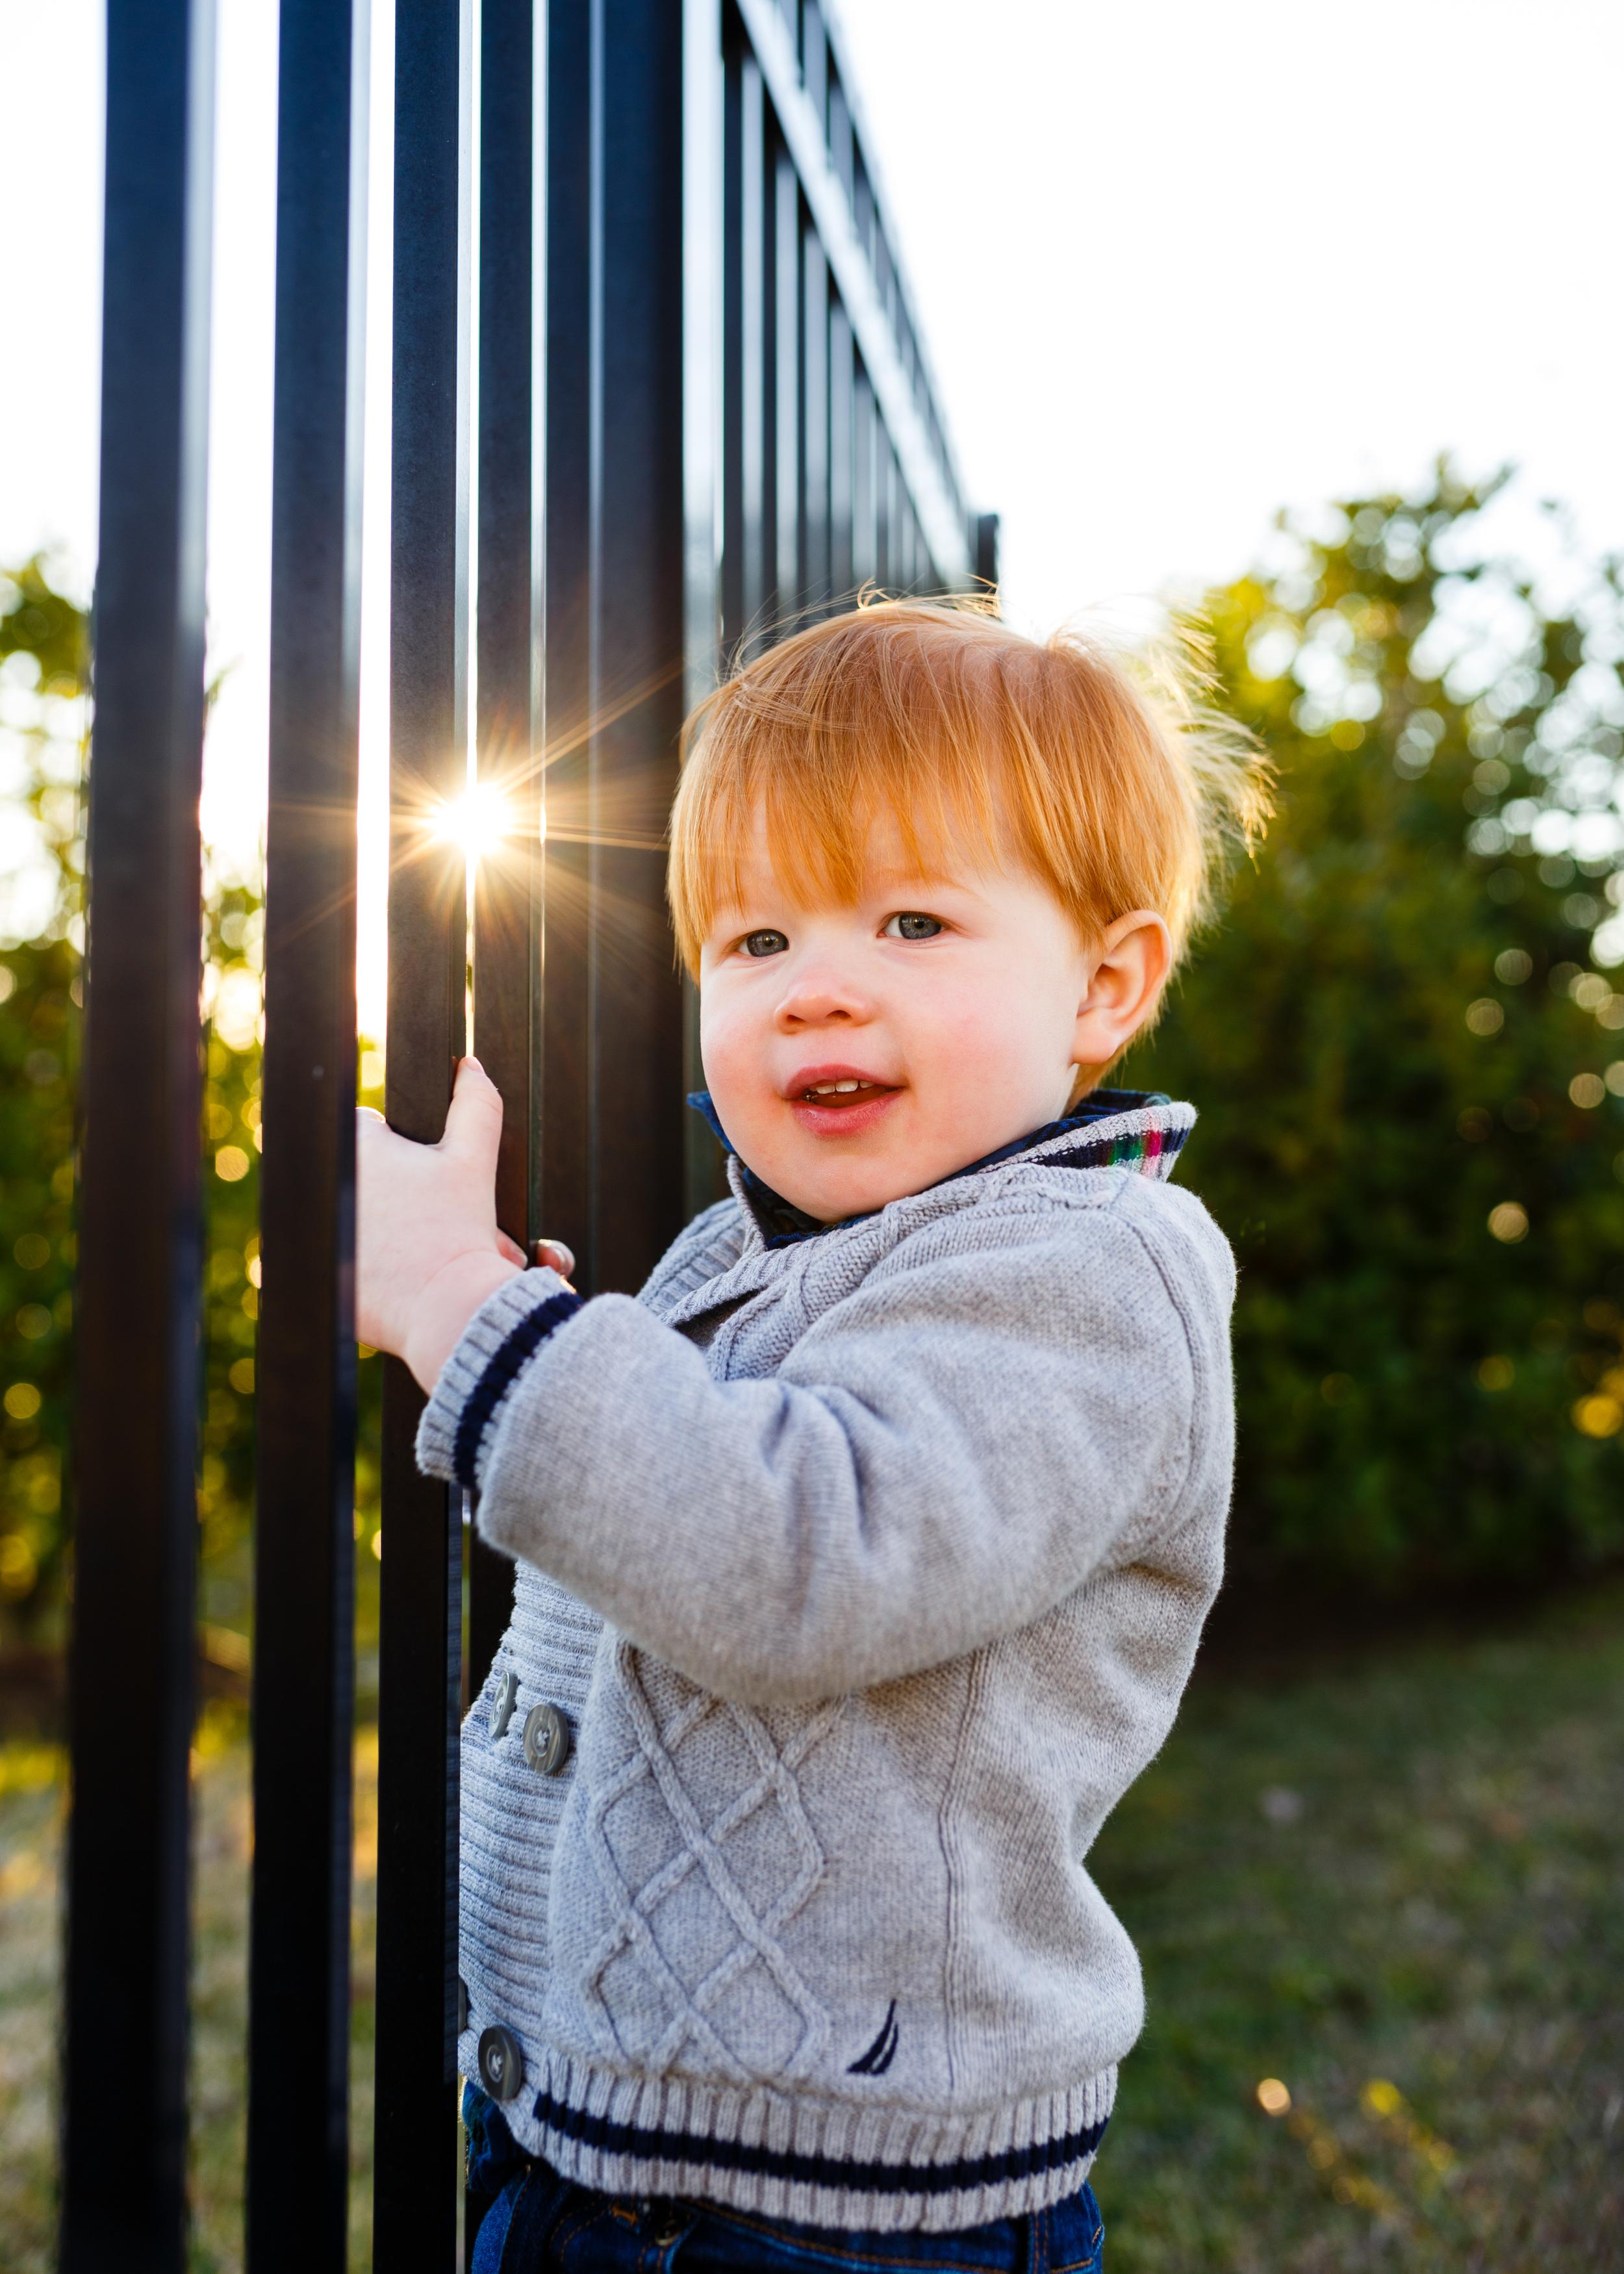 Family-child-portrait-lafayette-broussard-youngsville-photographer (7).jpg